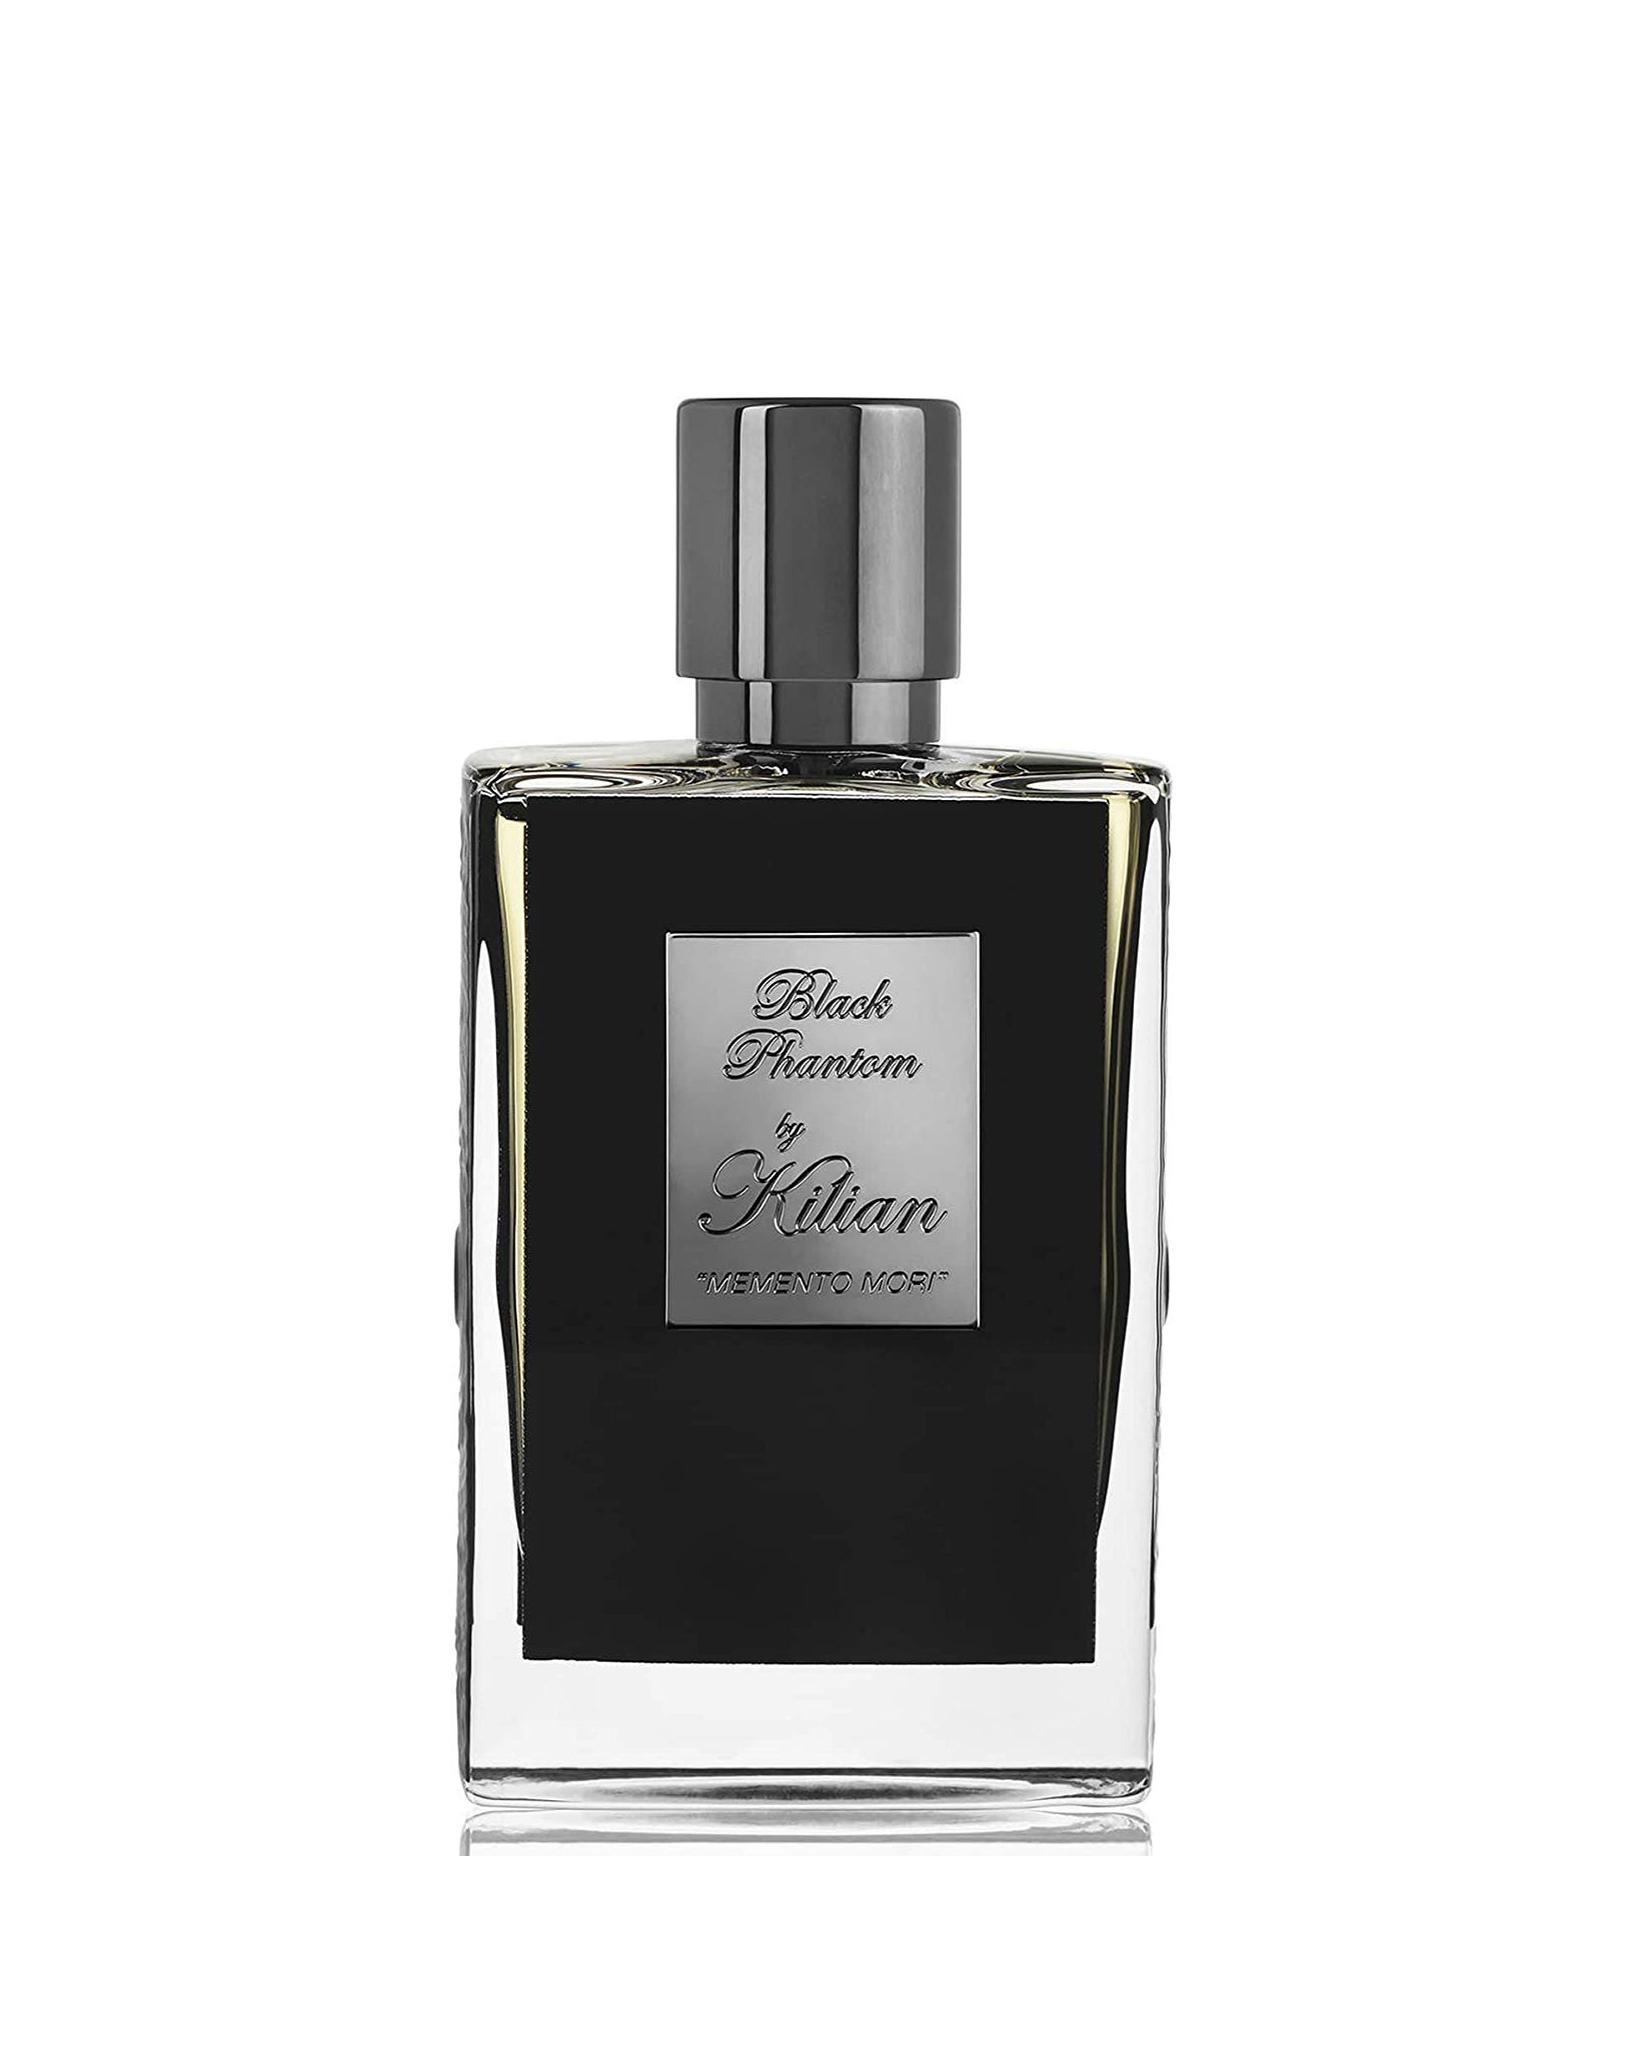 Nước hoa chiết Kilian Black Phantom [10ml]